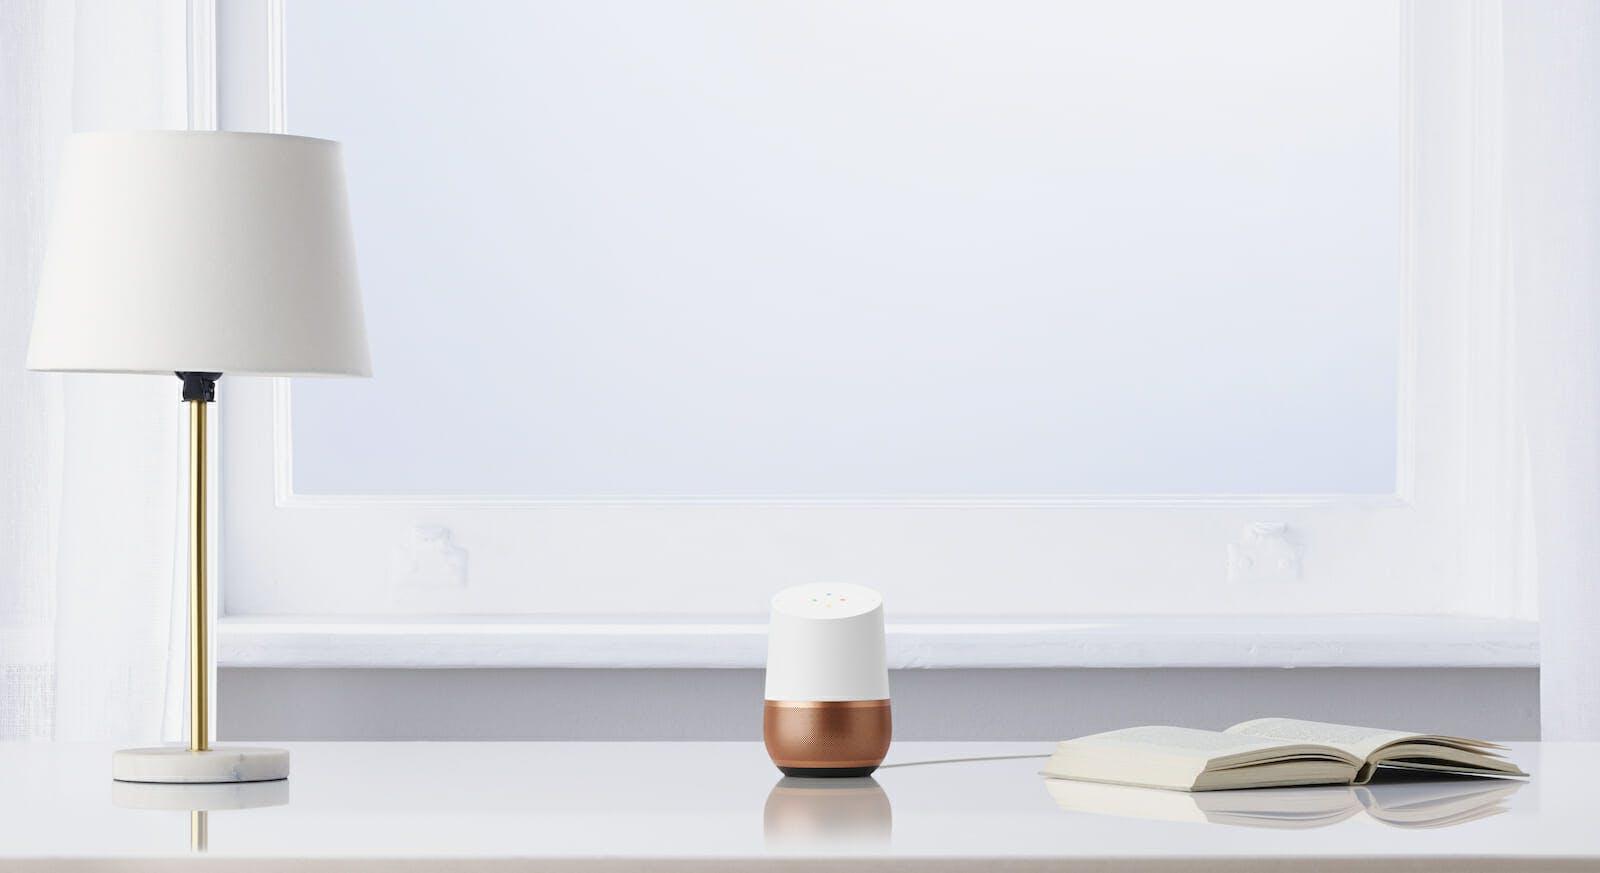 Google Home smart speaker with copper base